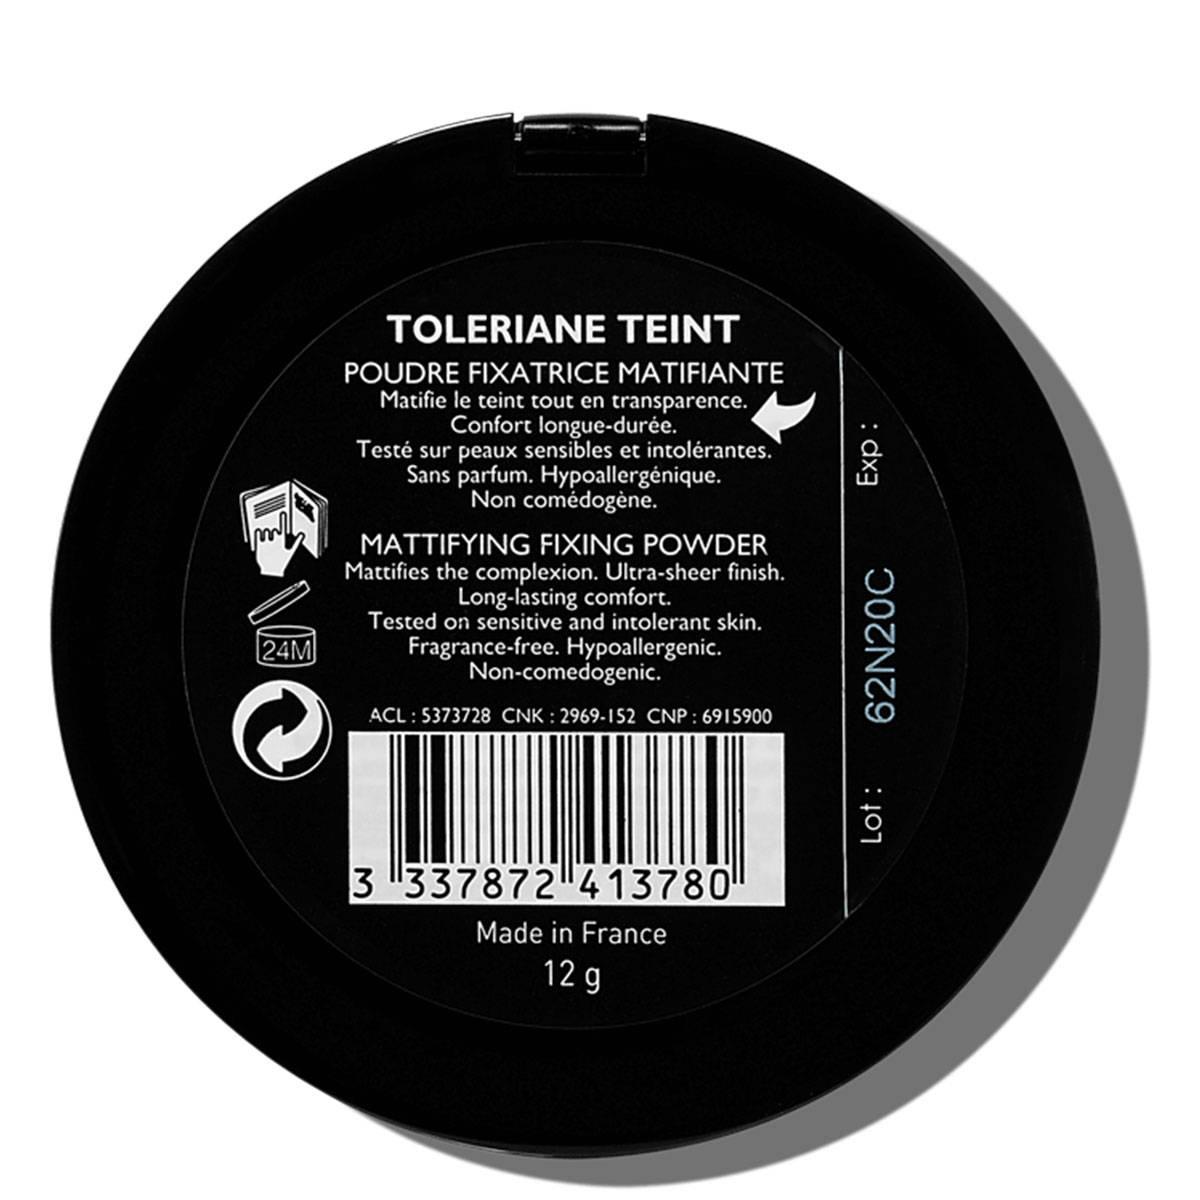 La Roche Posay Citlivá Toleriane Make-up PUDR Fixace 3337872413780